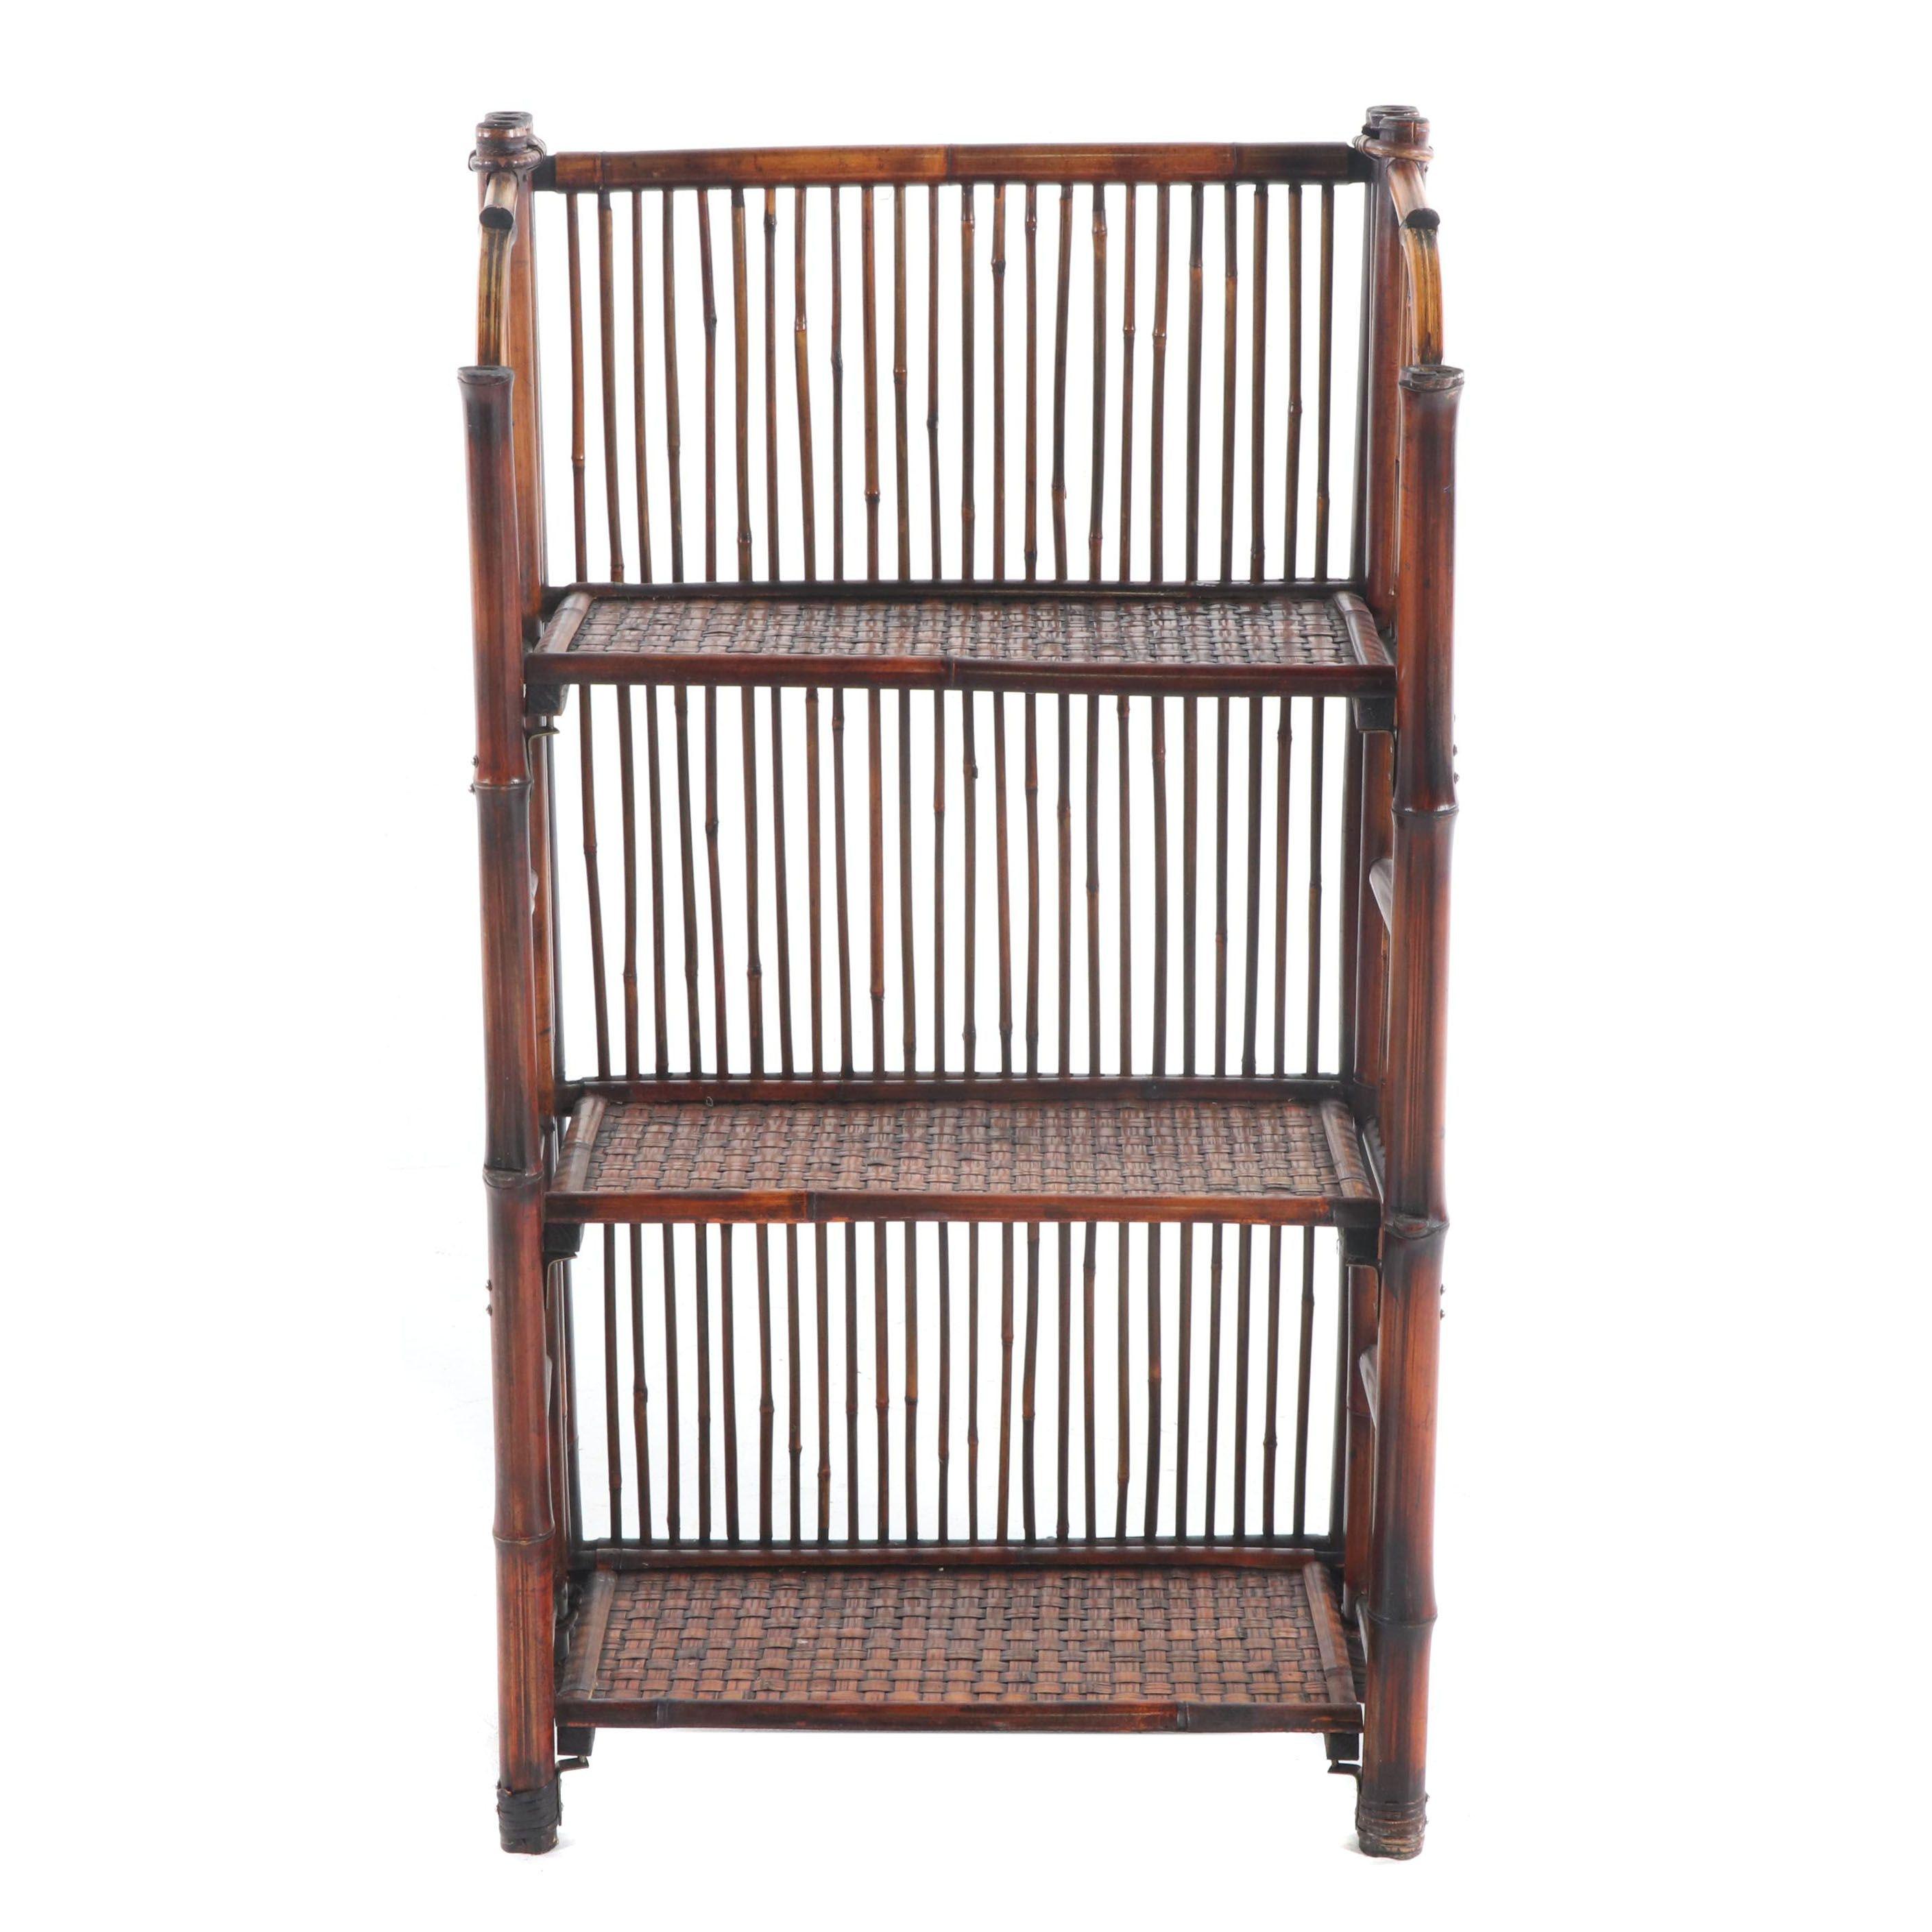 Bamboo Folding Shelf/Rack